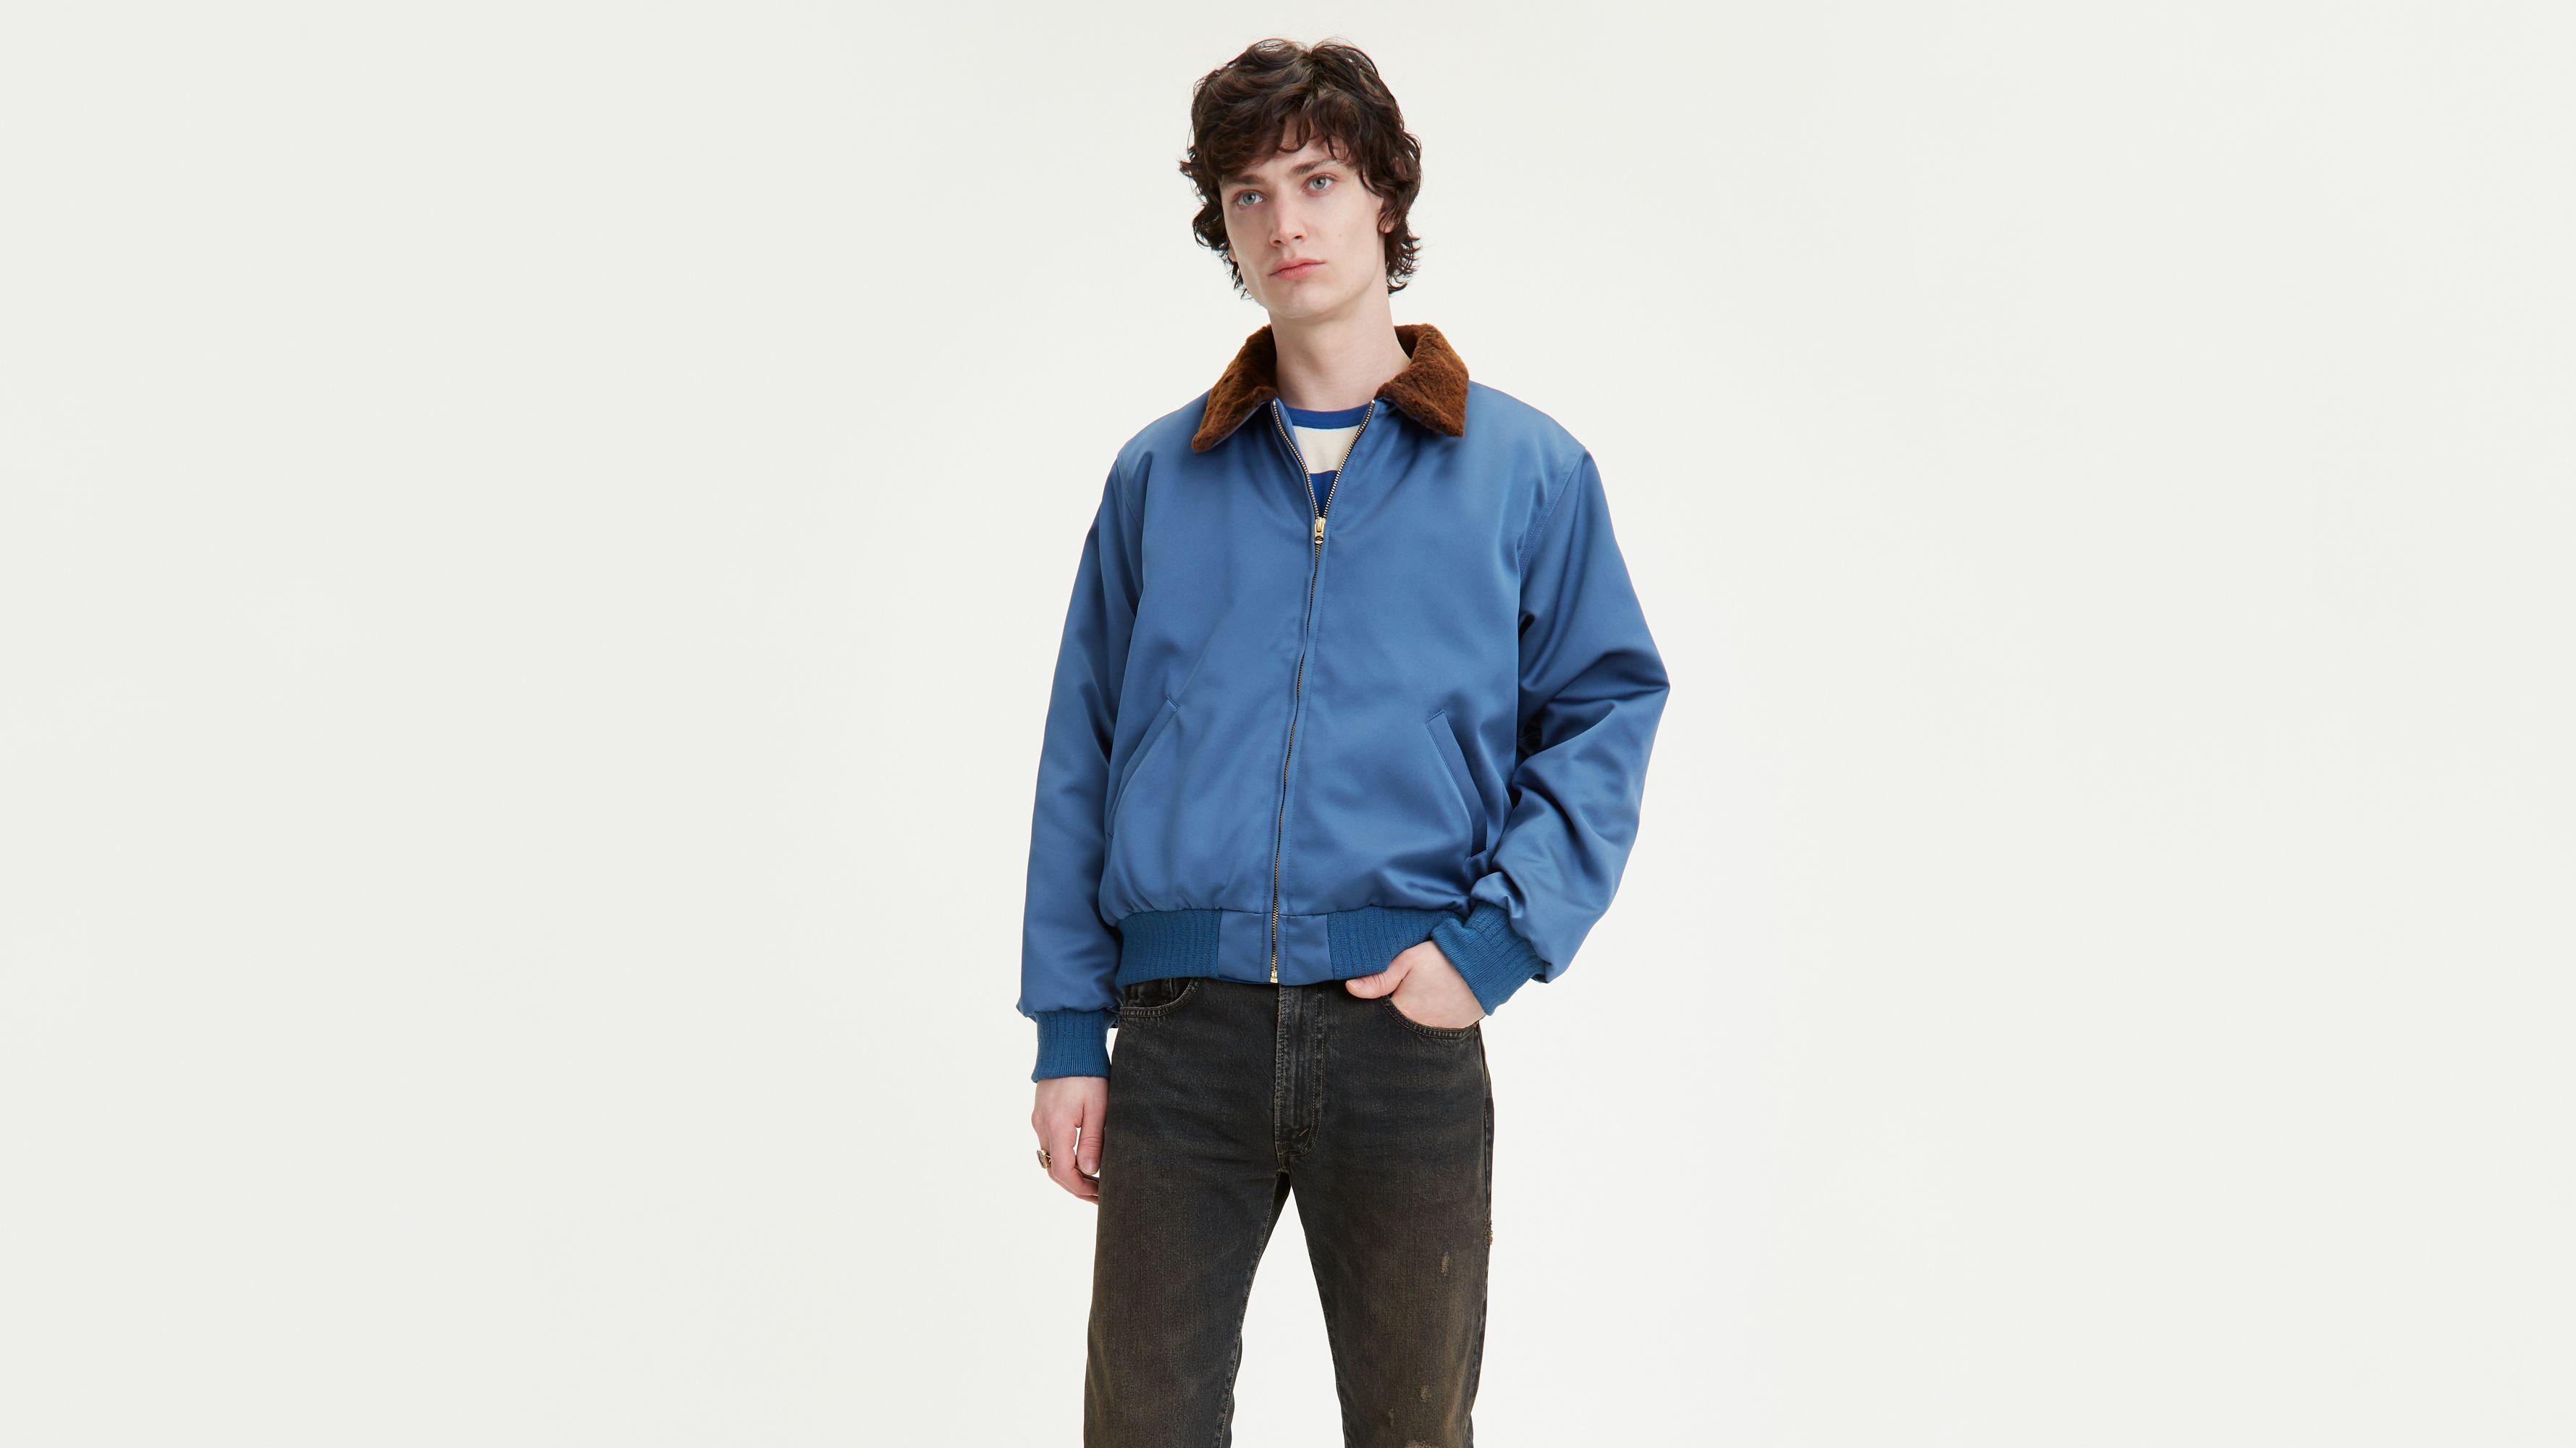 levis chaqueta piel azul hombre